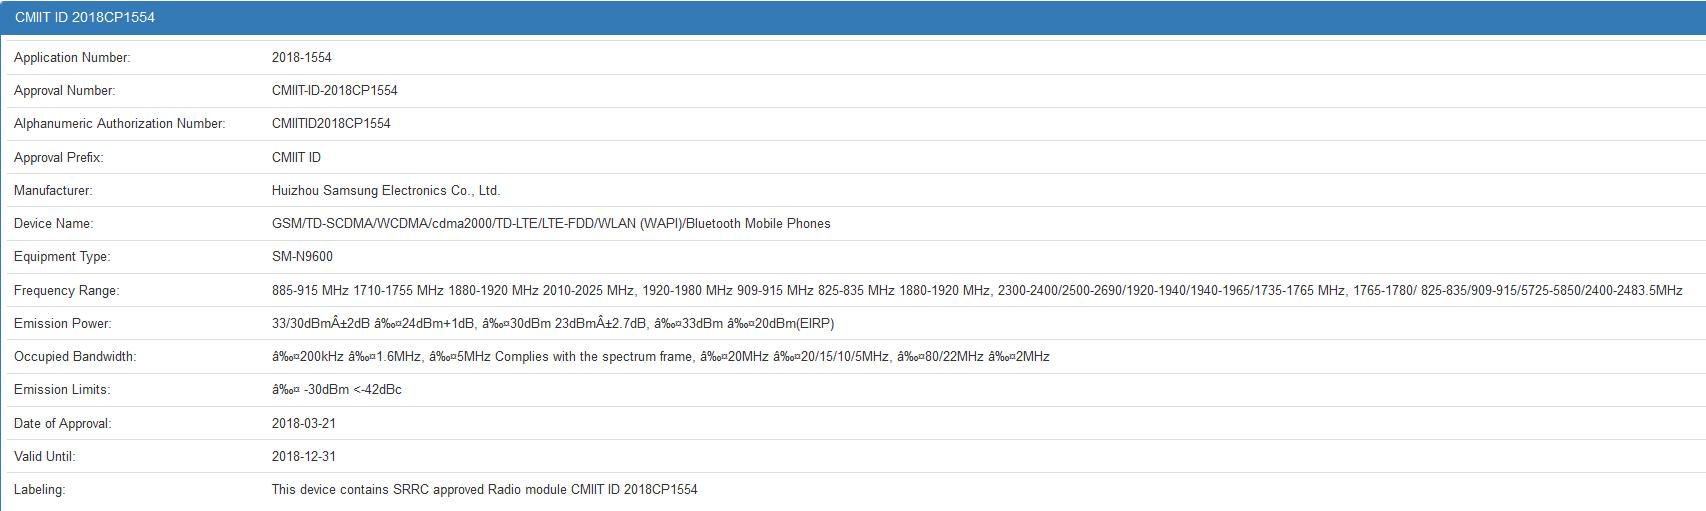 Samsung Galaxy NOTE 9 Modele Certificate 2